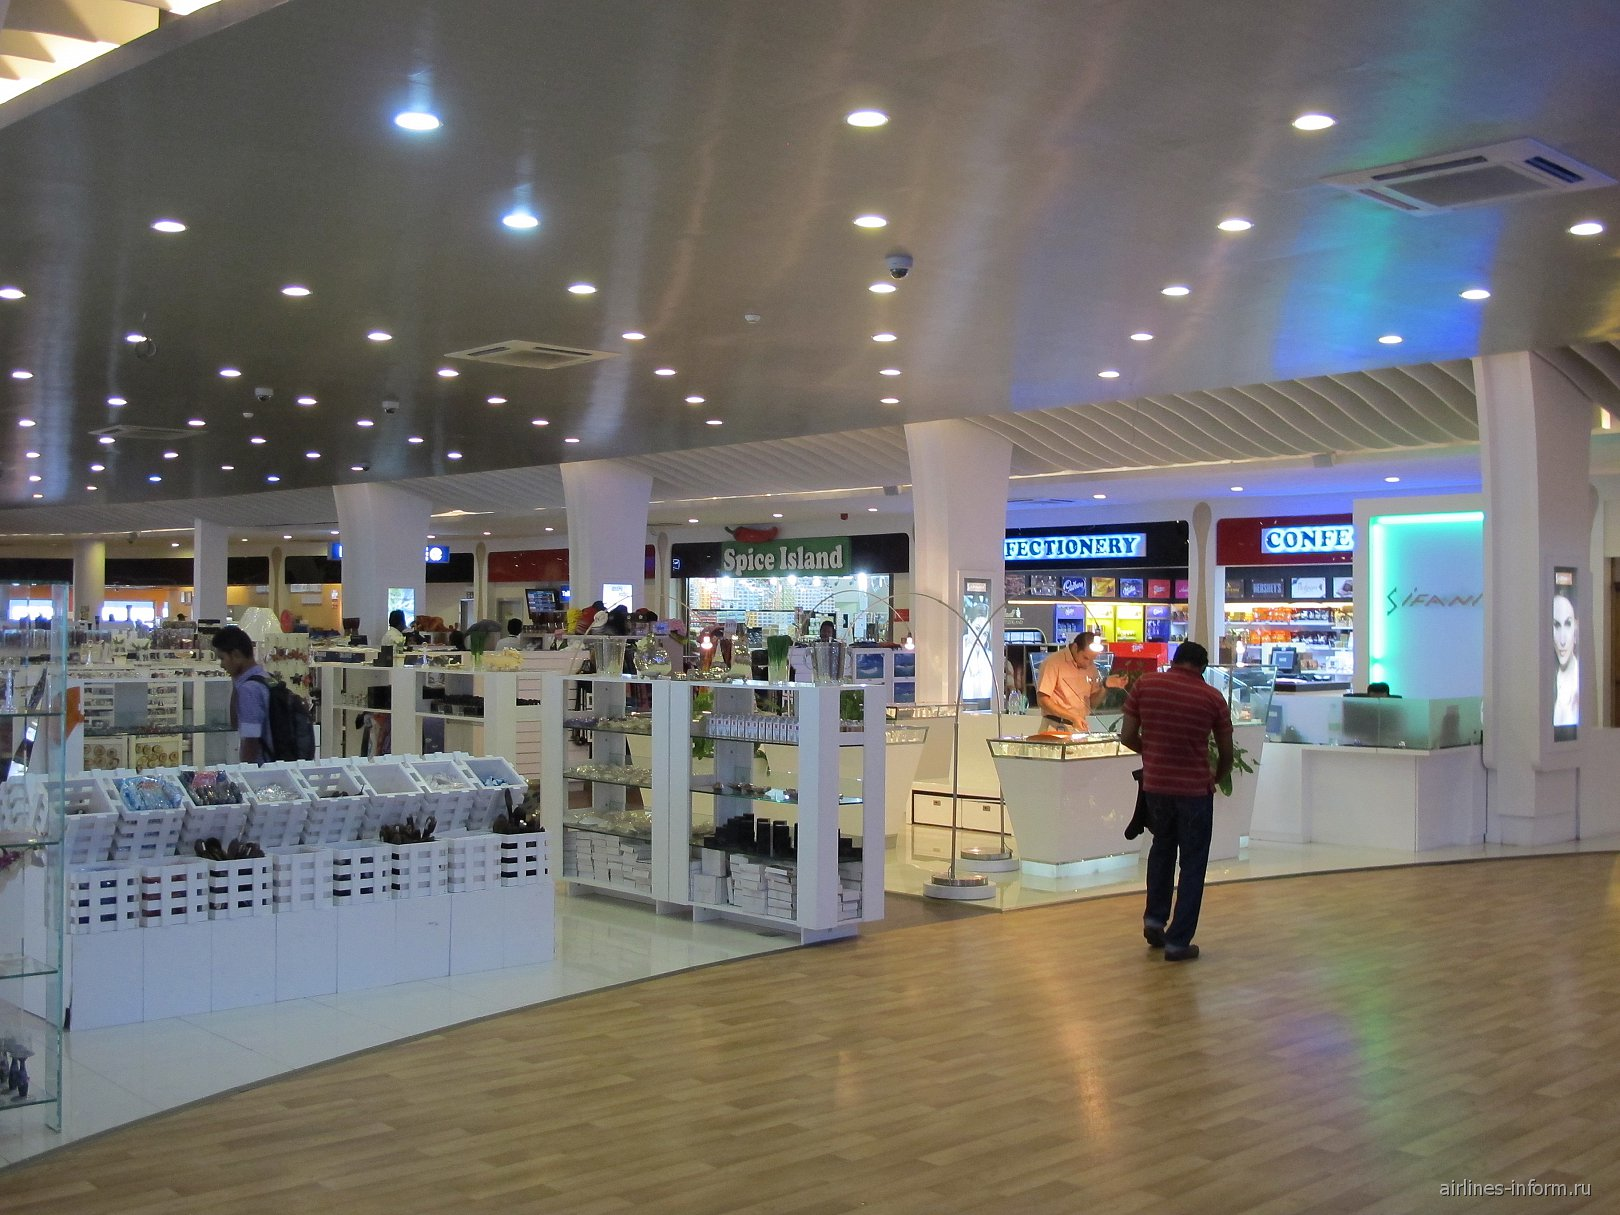 Галерея магазинов в аэропорту Мале